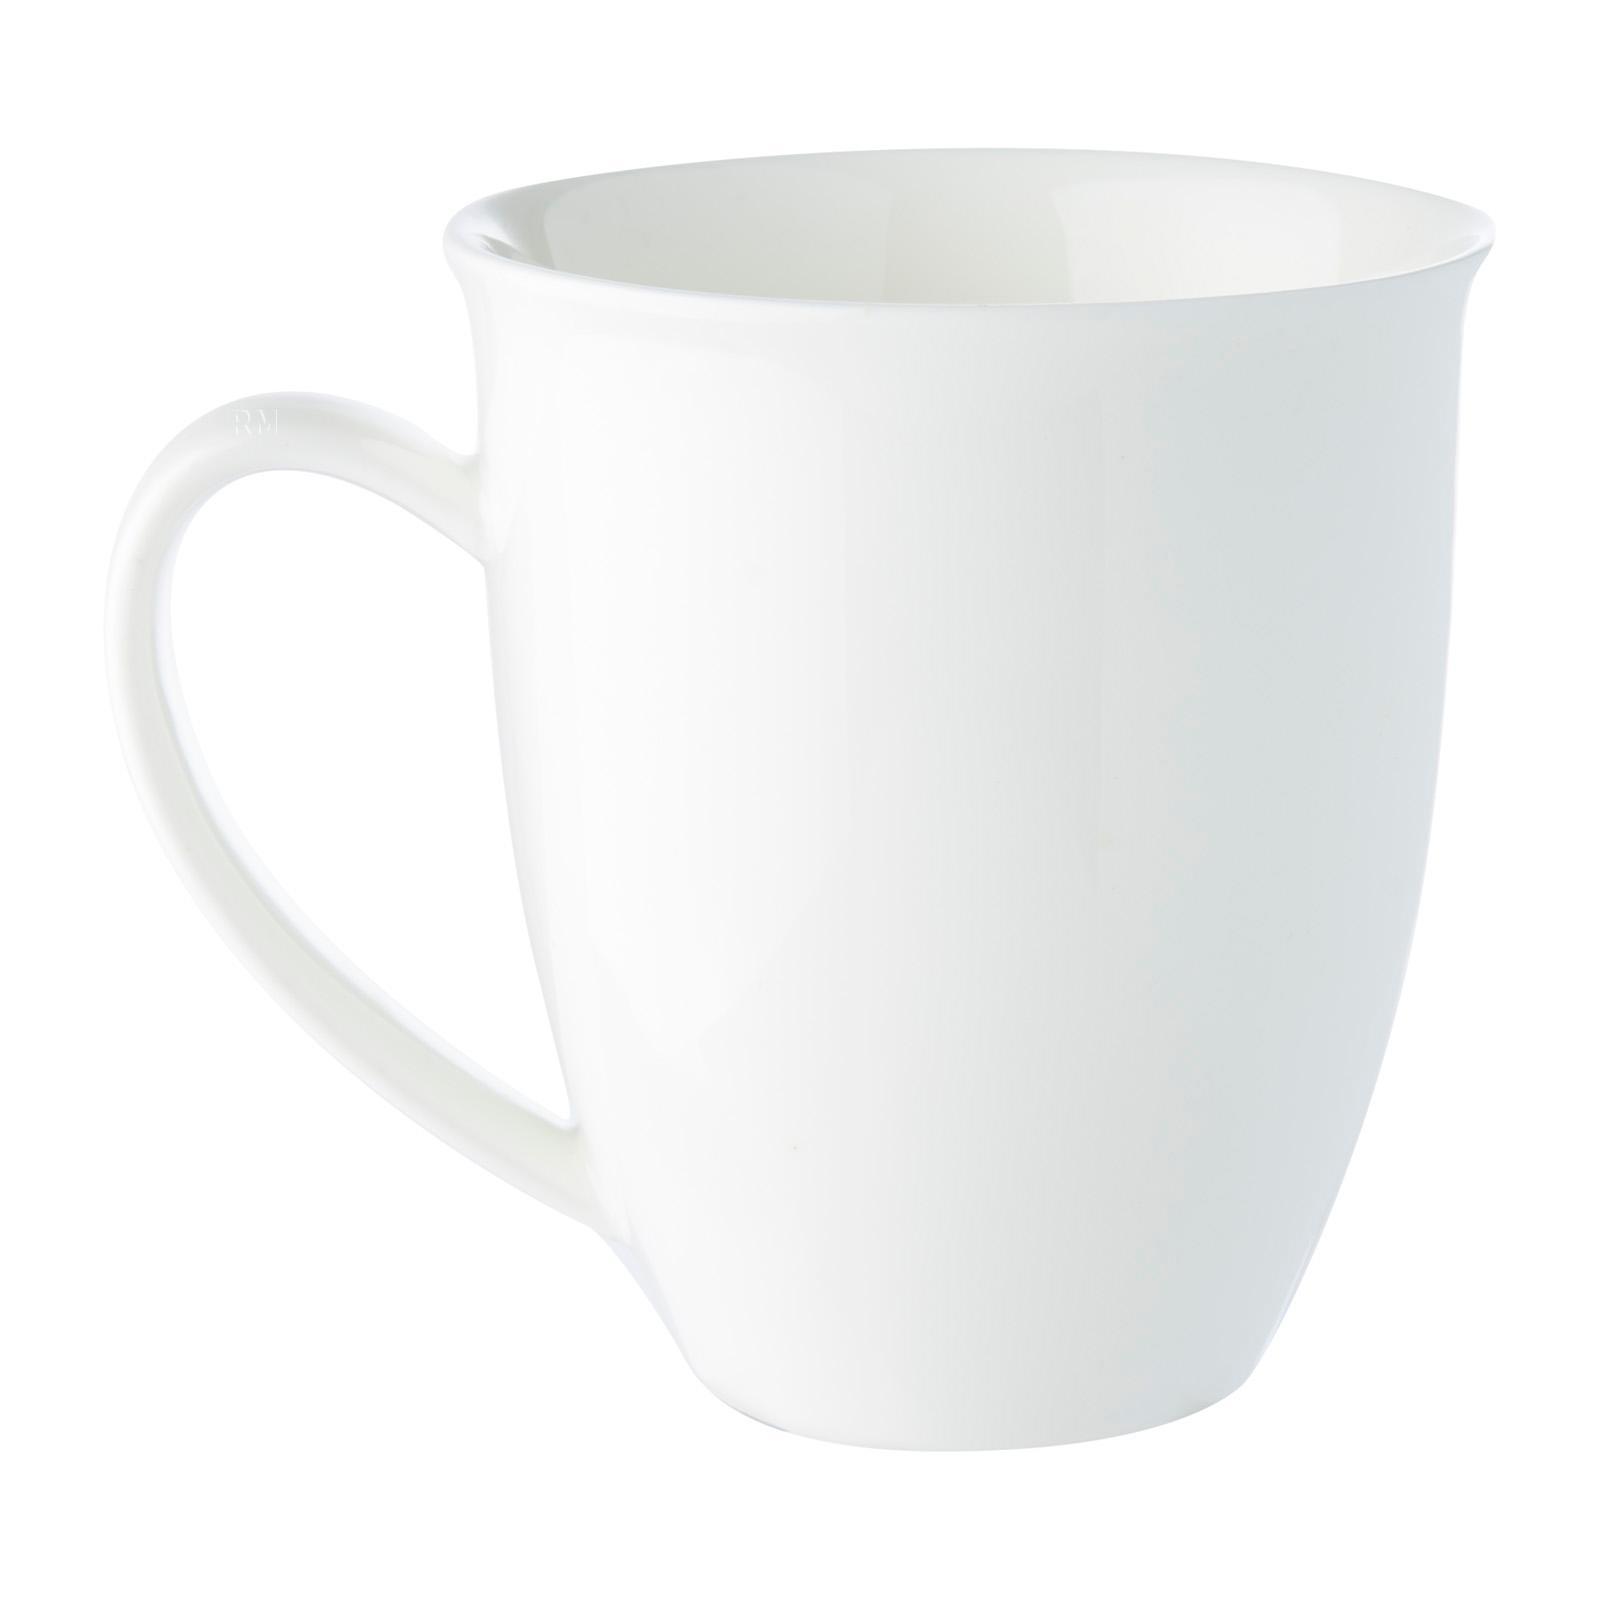 Wilmax England Porcelain Mug 380 ML